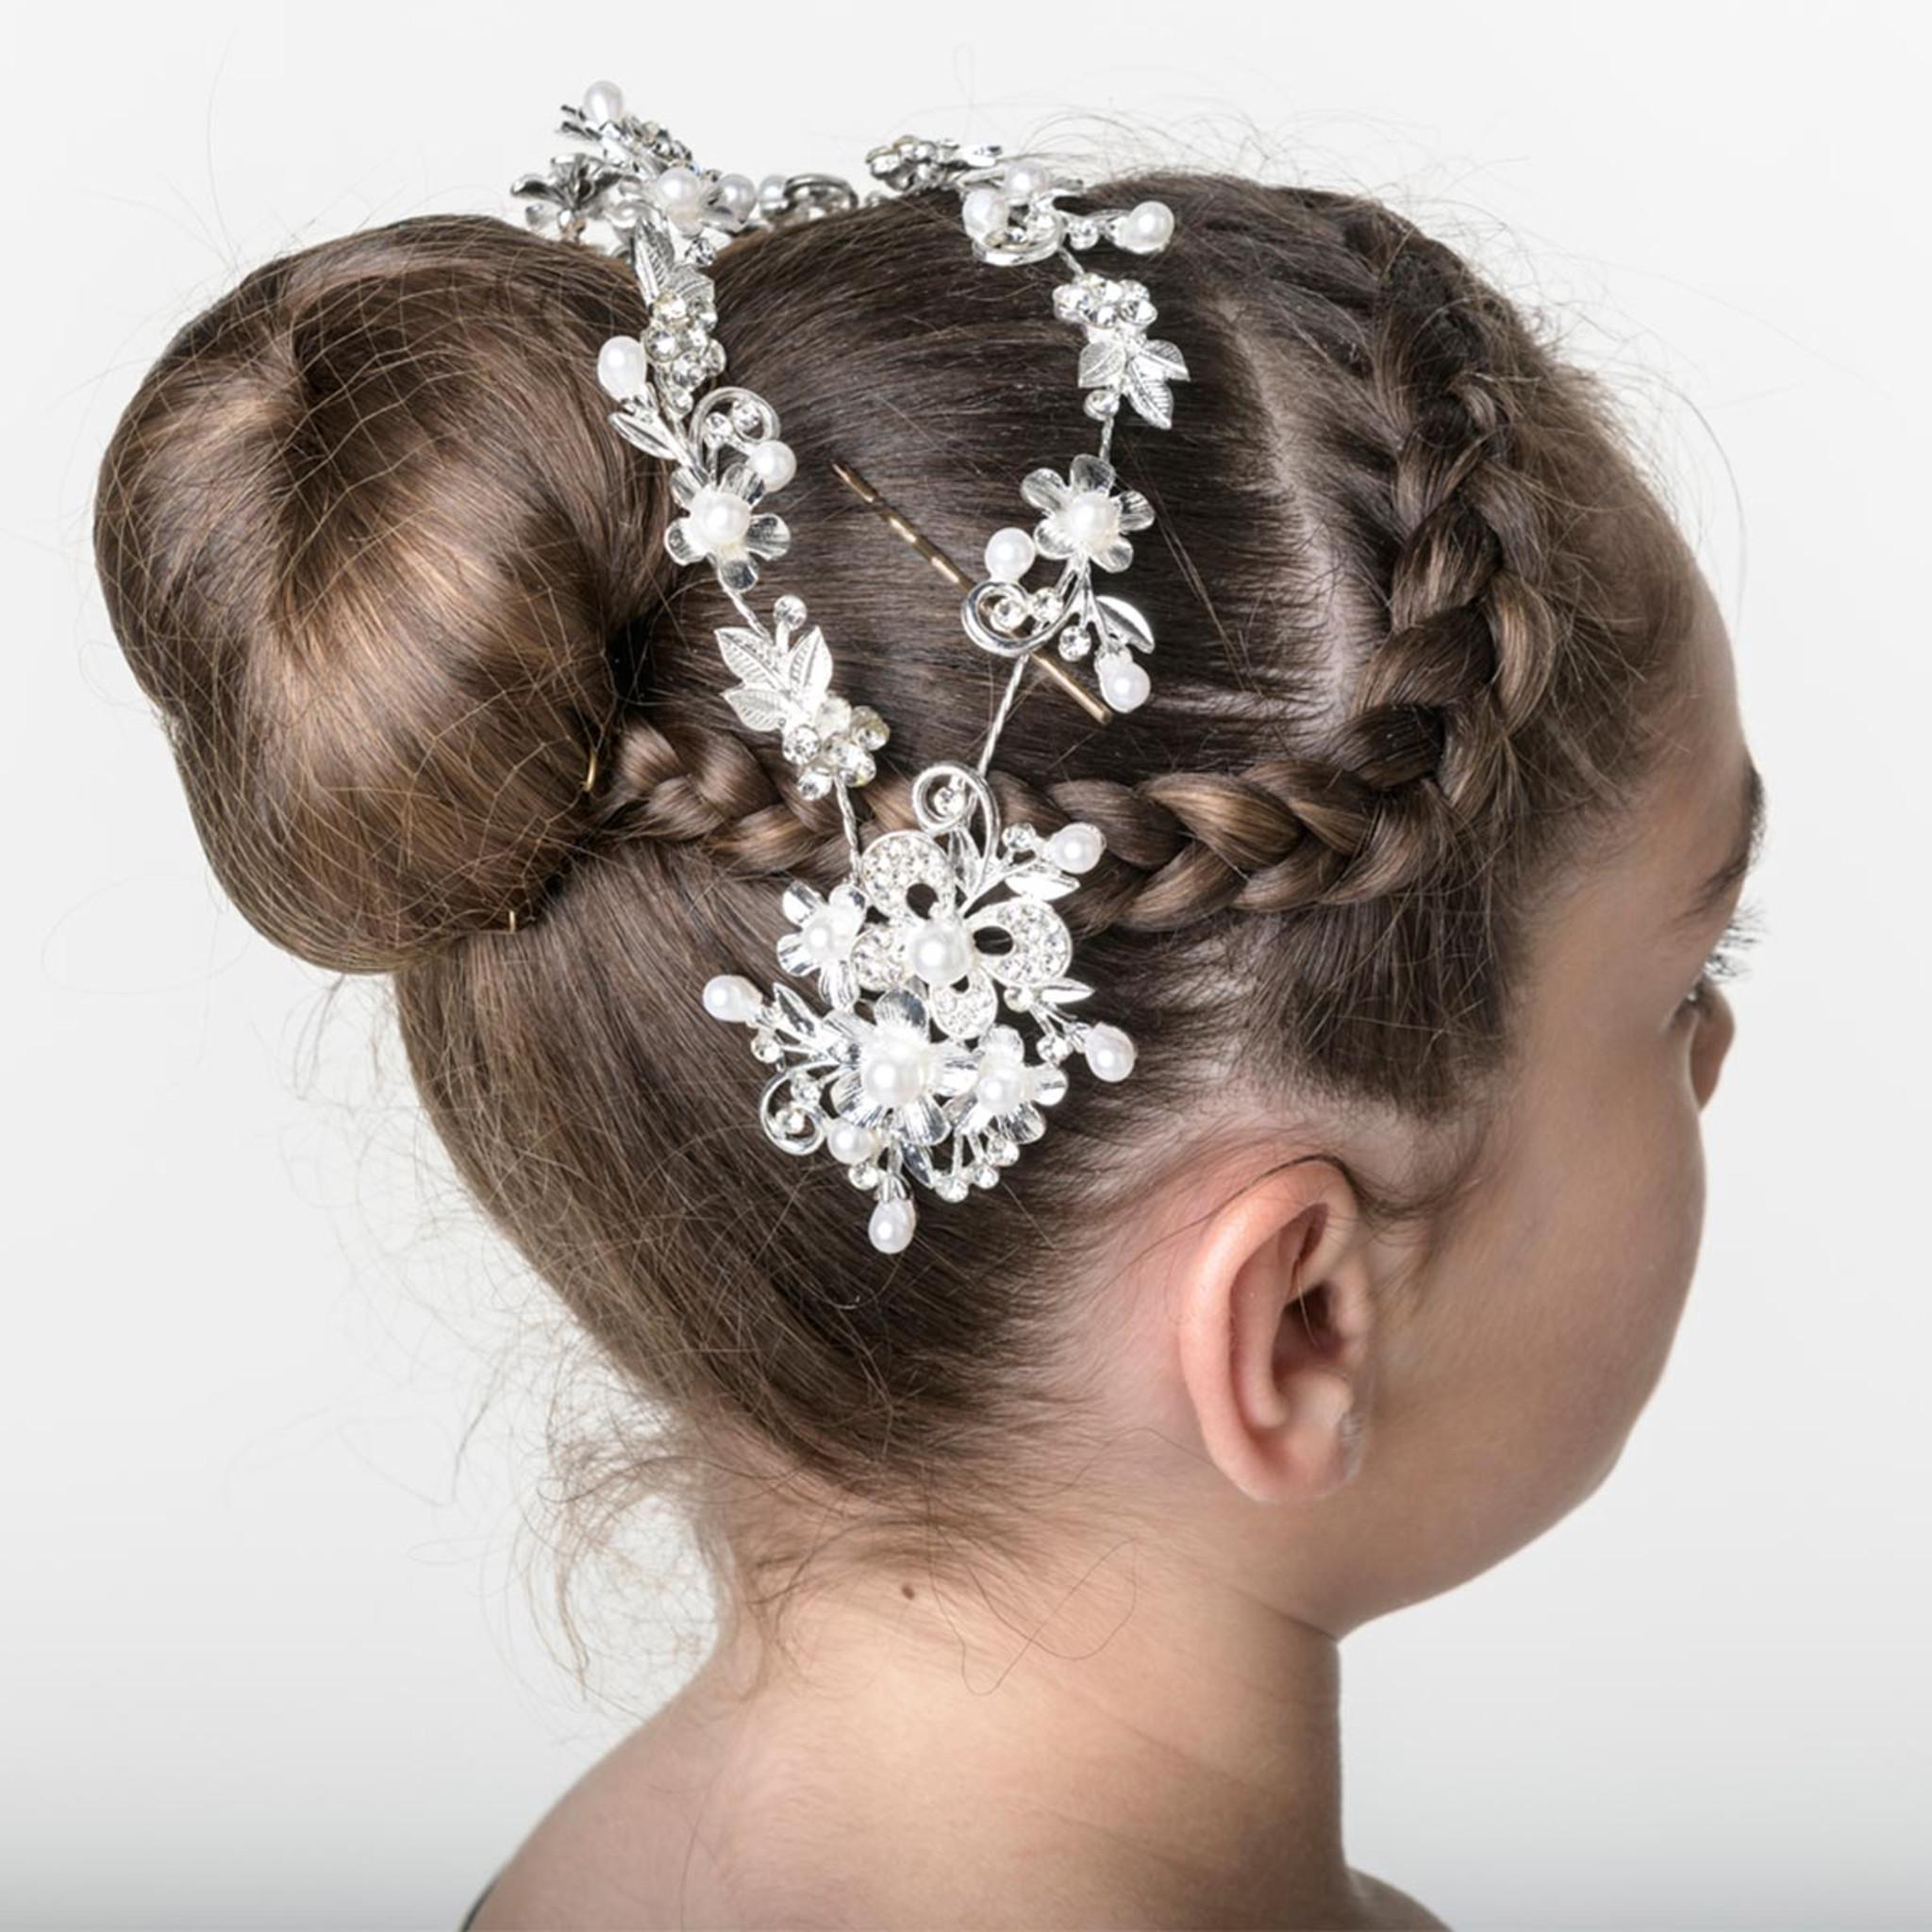 Studio 7 Dancewear Floral Comb Headband - DANCE DIRECT® 73b11d489b8